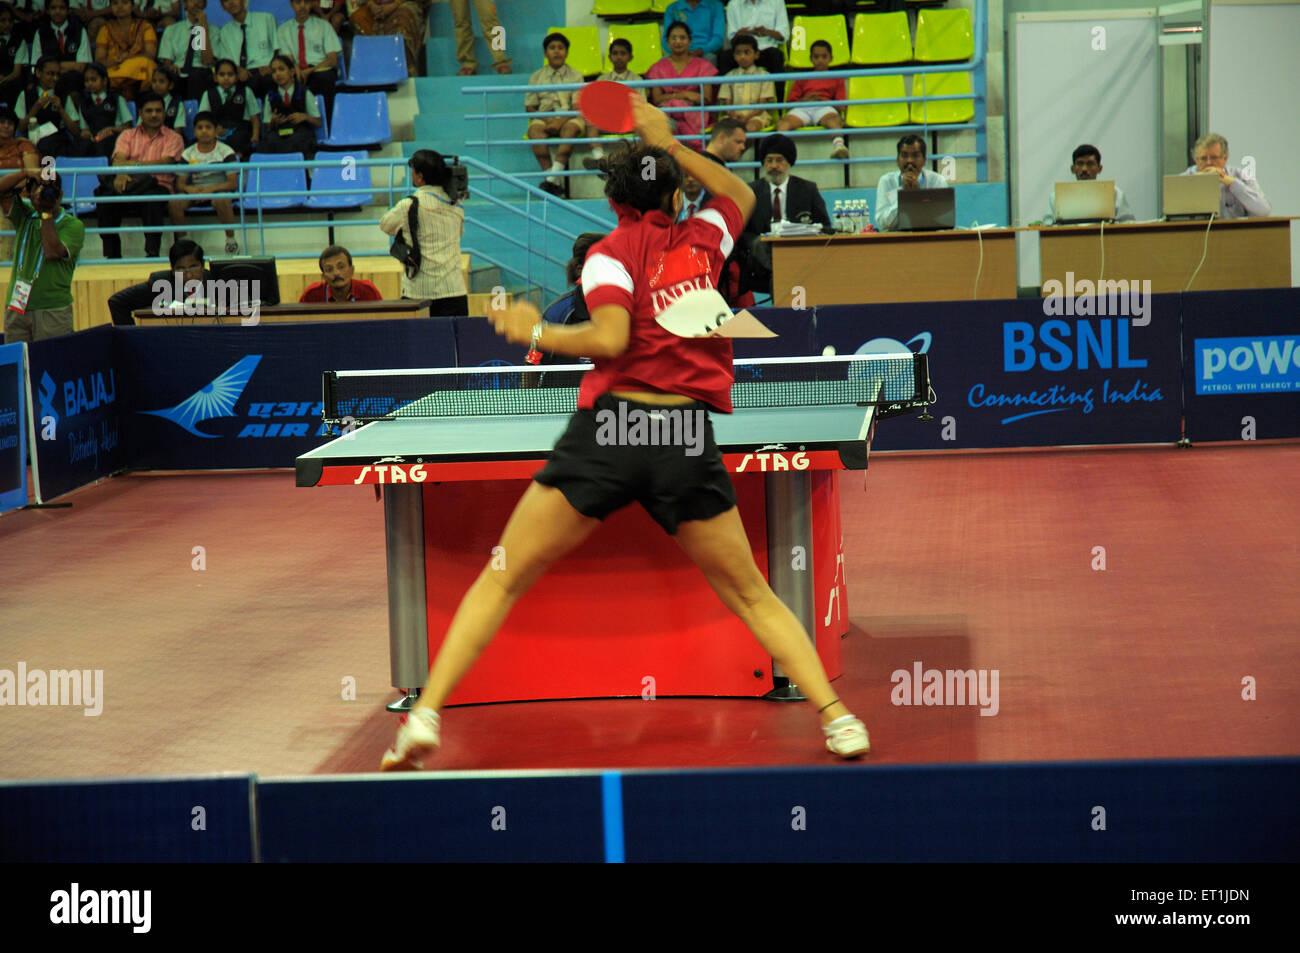 Neha aggarwal à jouer au tennis de table; Pune Maharashtra; Inde; 15 octobre 2008 NOMR Photo Stock